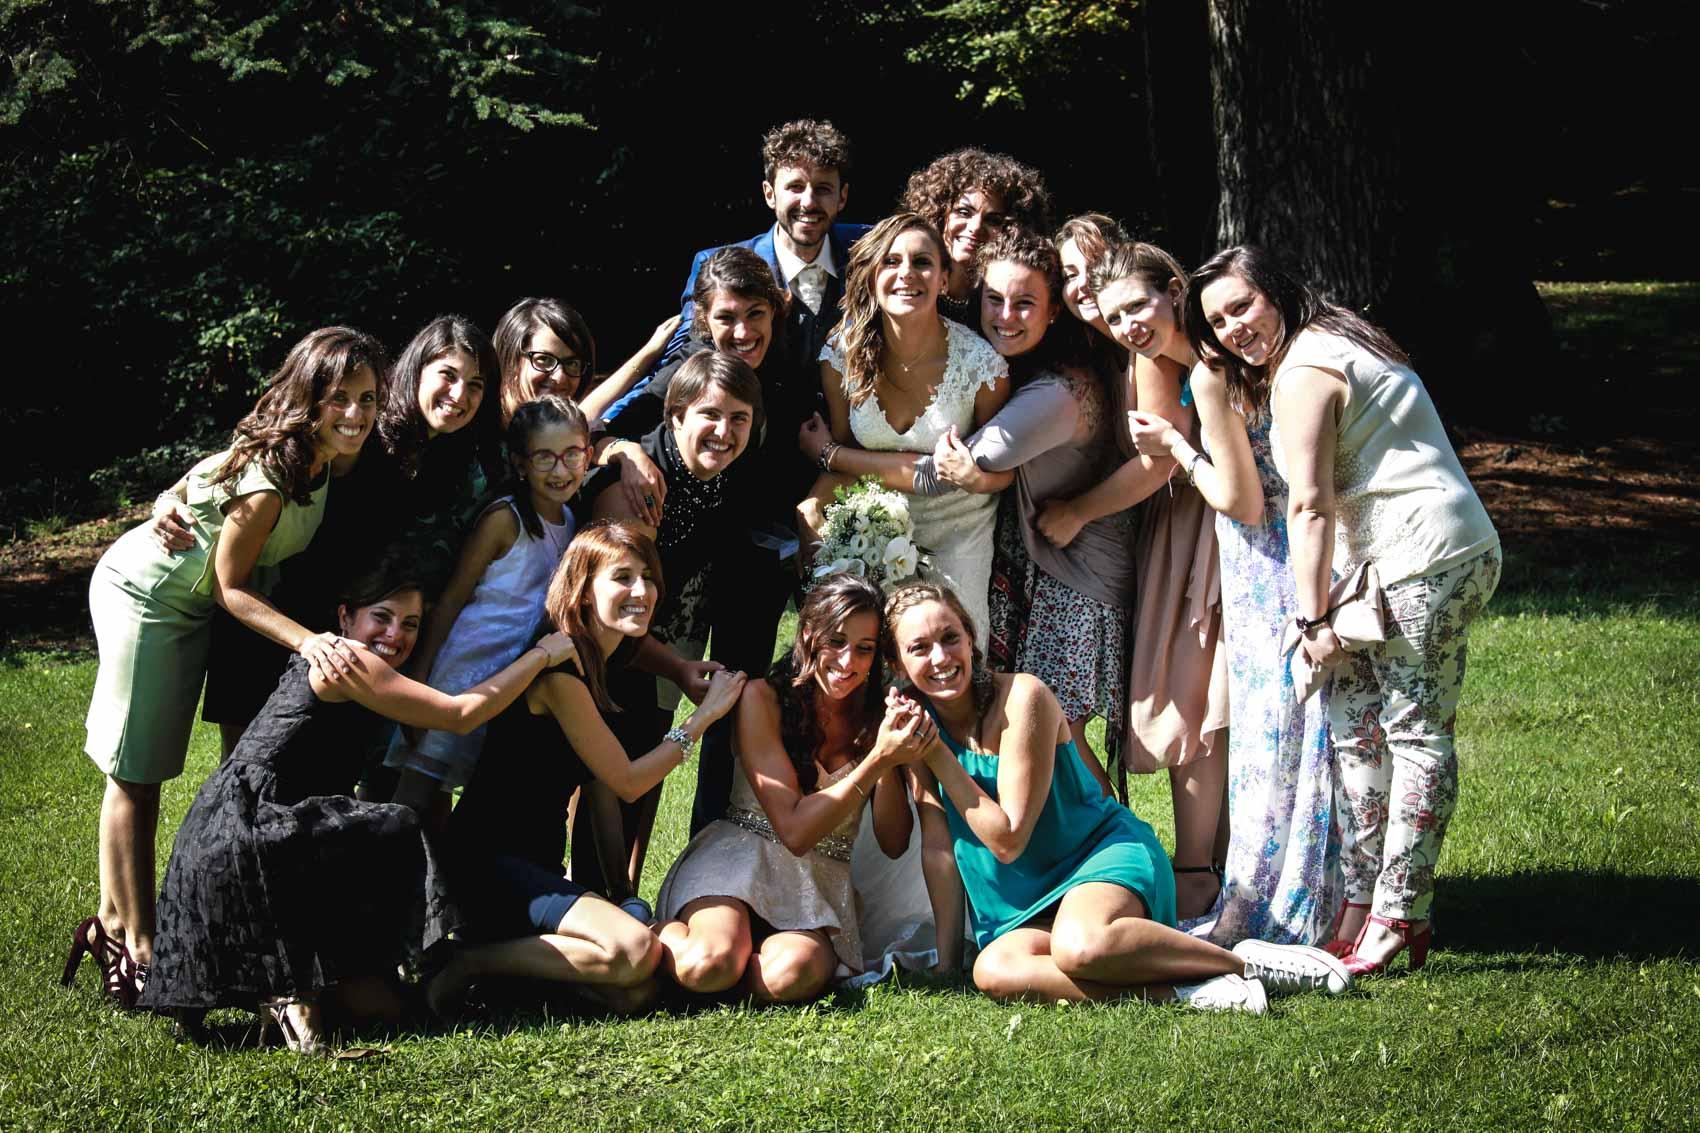 monica sica_villa sassi_matrimonio_torino_fotografia_portfolio_location-58